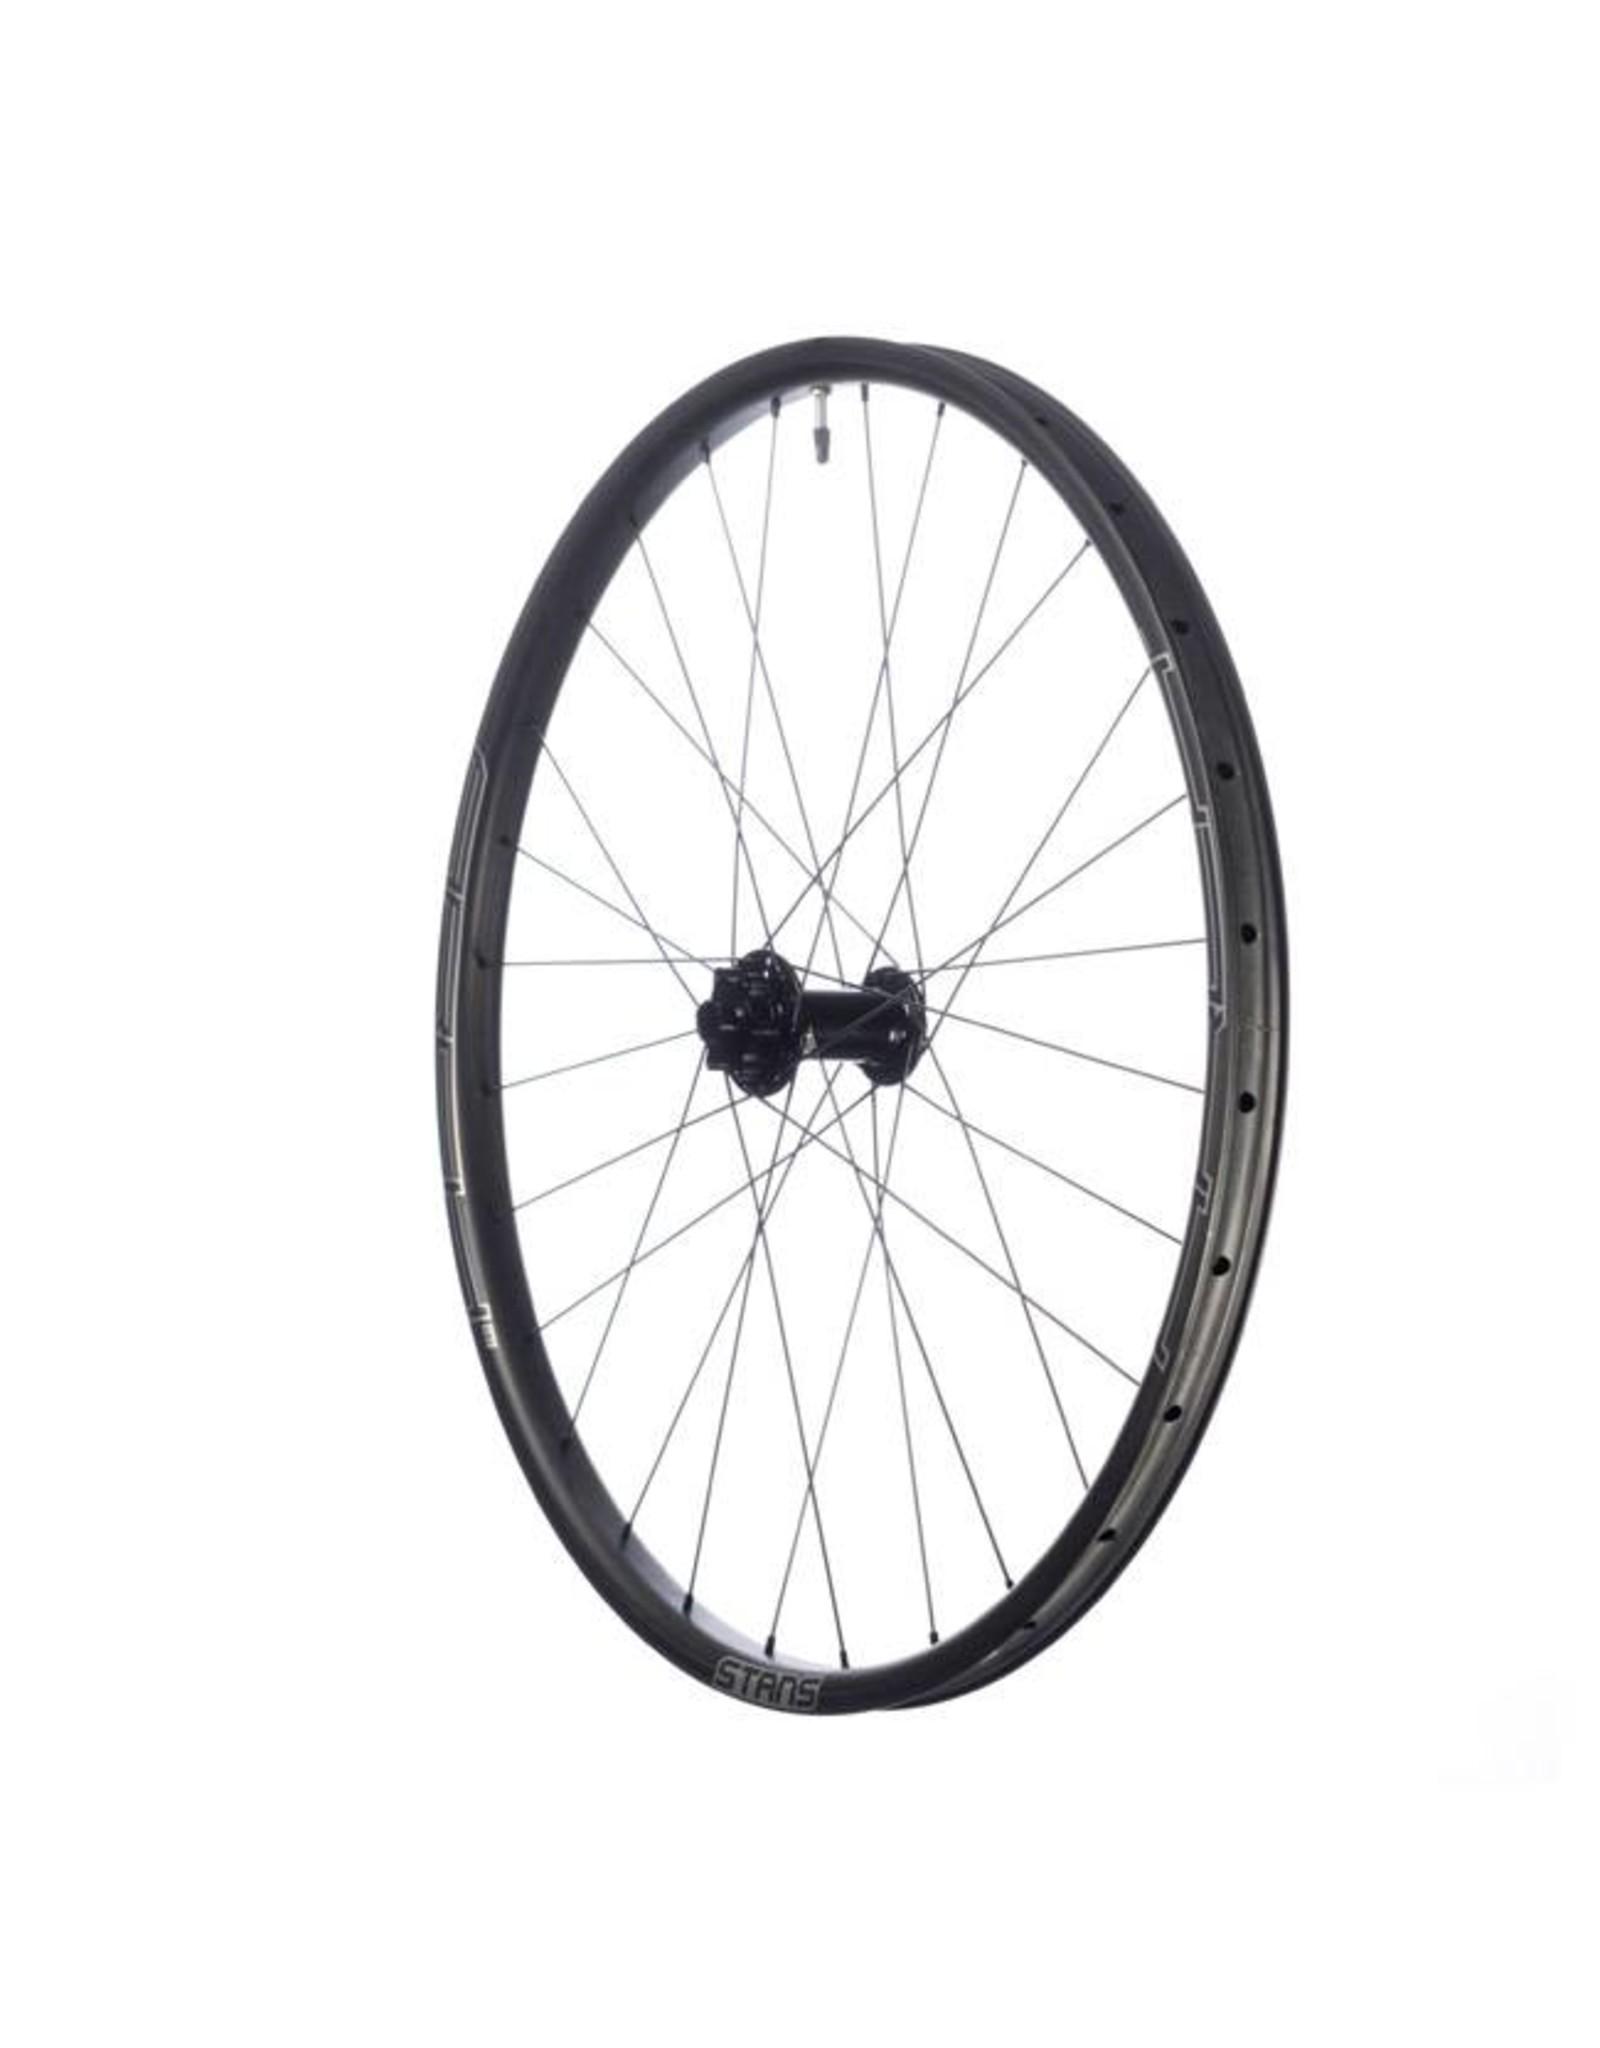 "Stan's No Tubes Stan's No Tubes Arch CB7 Rear Wheel: 27.5"" Carbon, 12 x 148mm Boost, 6- Bolt Disc, Shimano Freehub, Black"